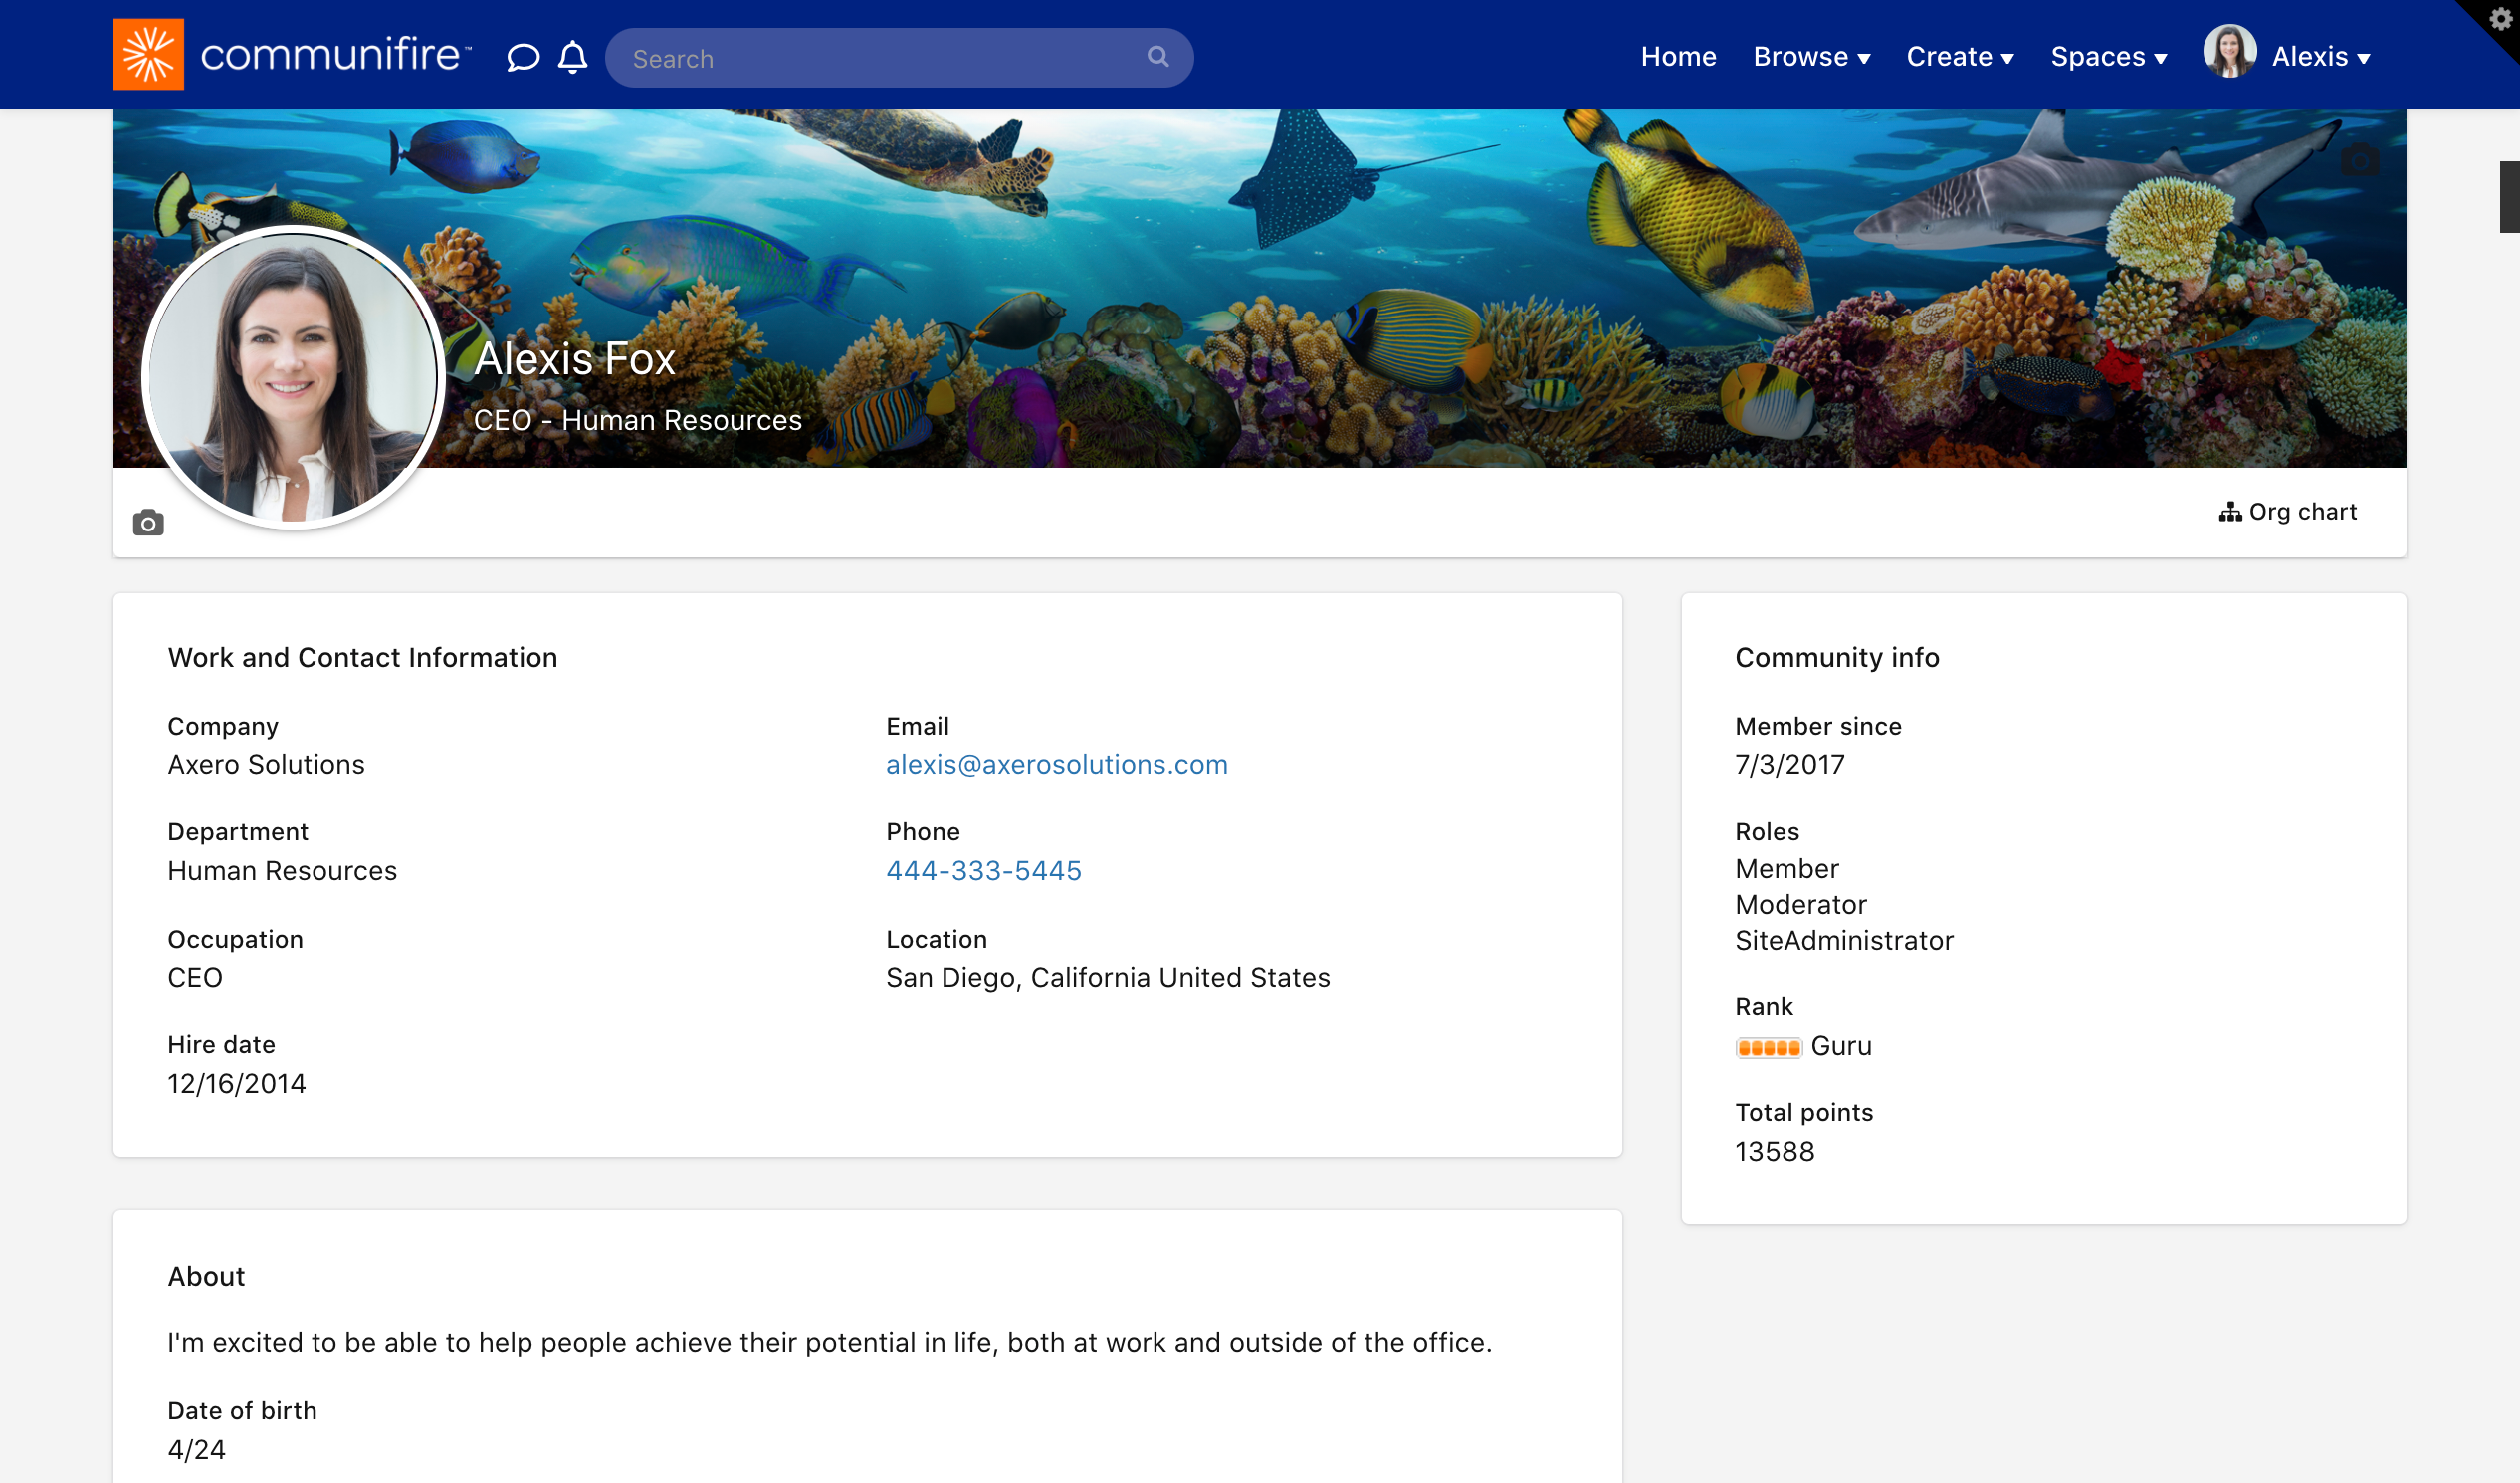 User profile with side menu hidden